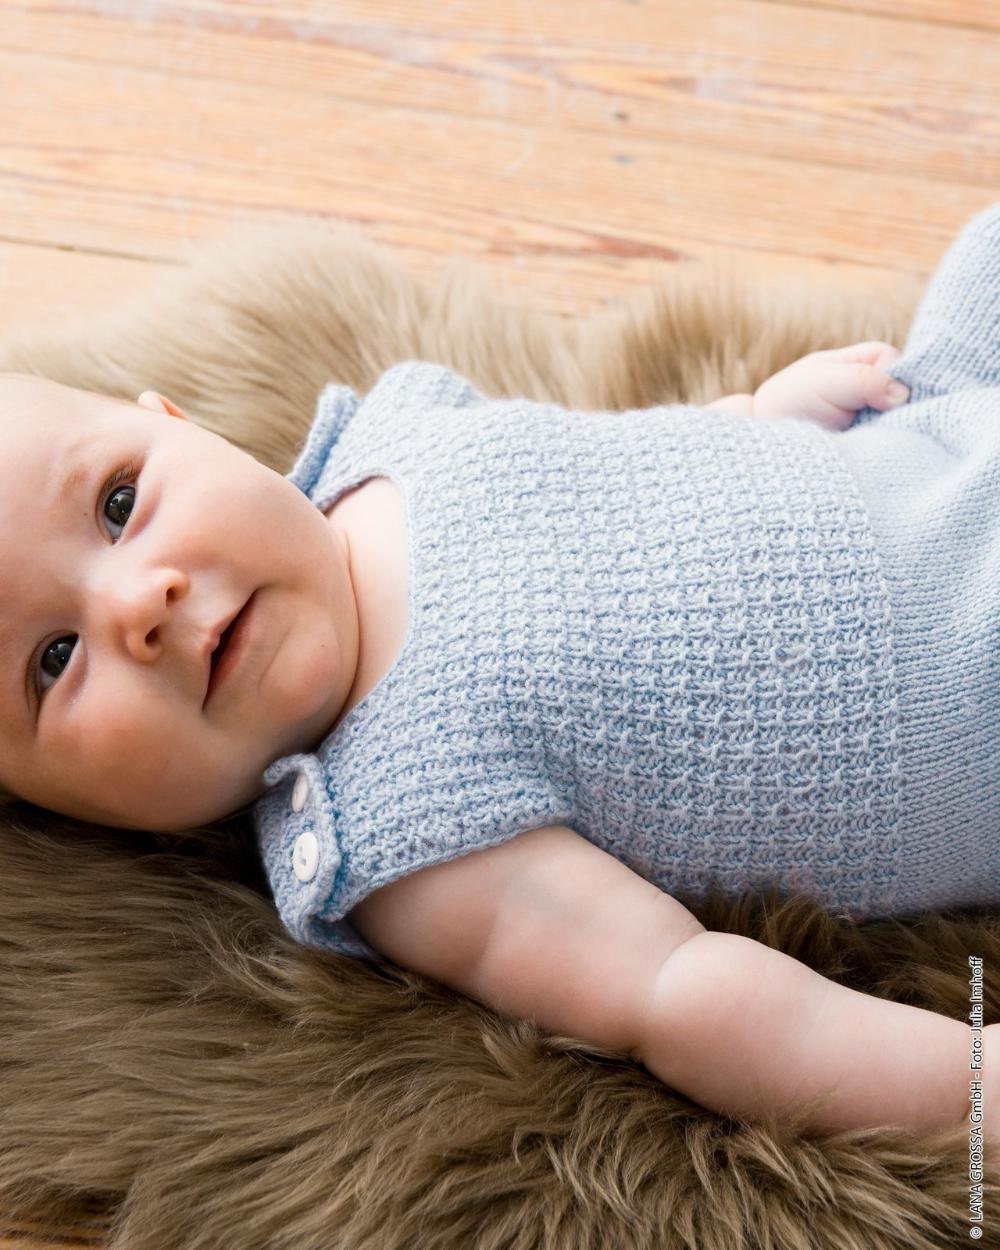 Models Cool Wool Baby Romper Lana Grossa In 2020 Baby Strampler Strickanleitungen Kostenlose Strickmuster